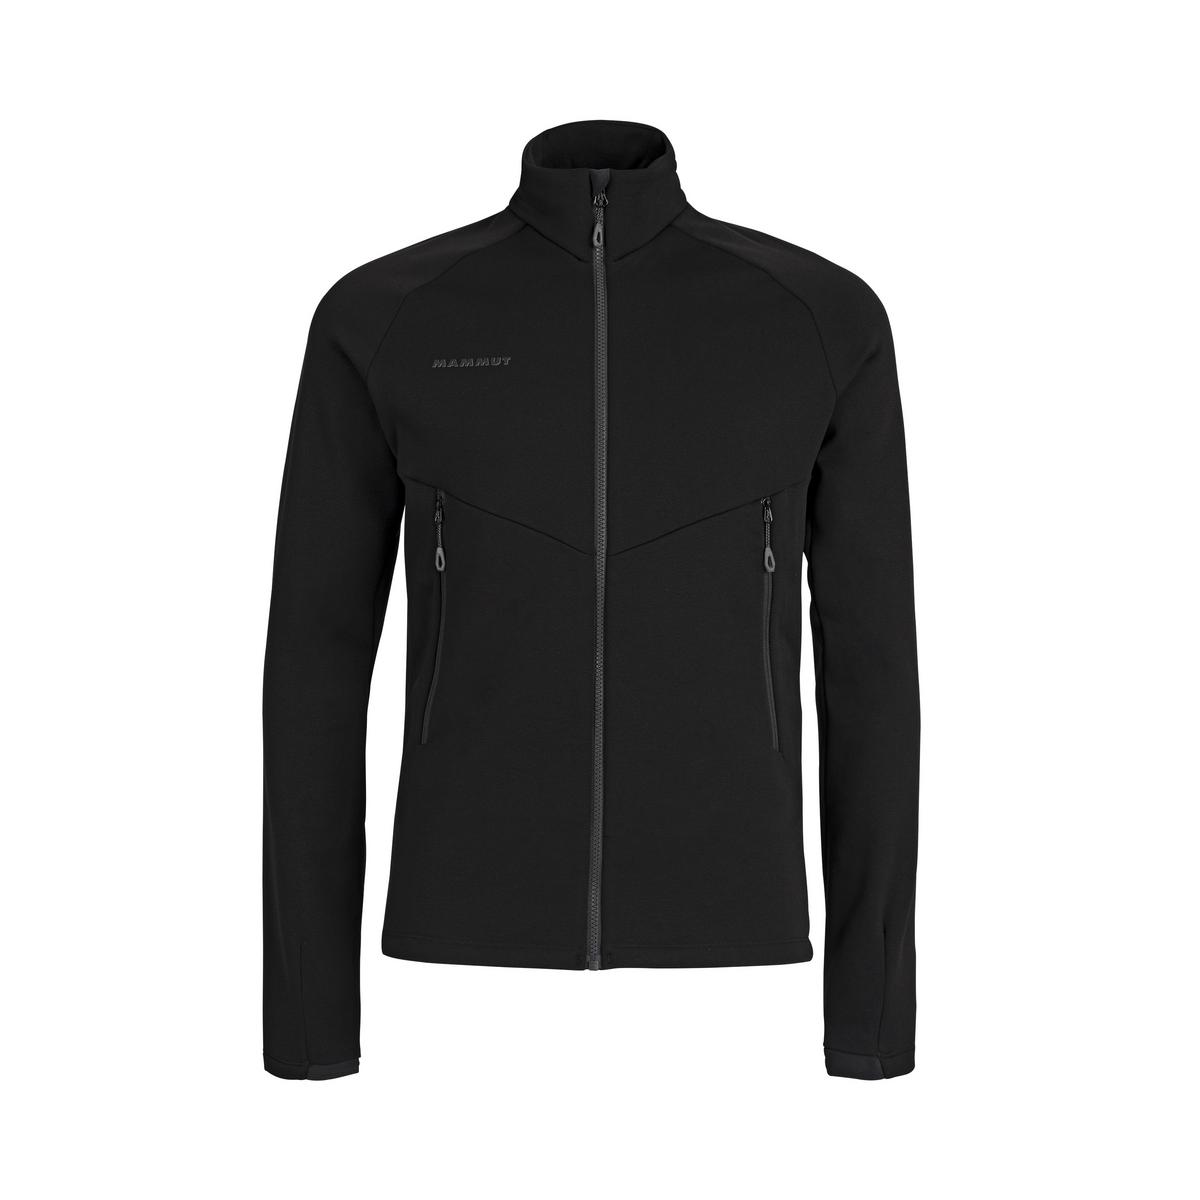 cheap for discount 9bb92 91298 Aconcagua ML Jacket Men